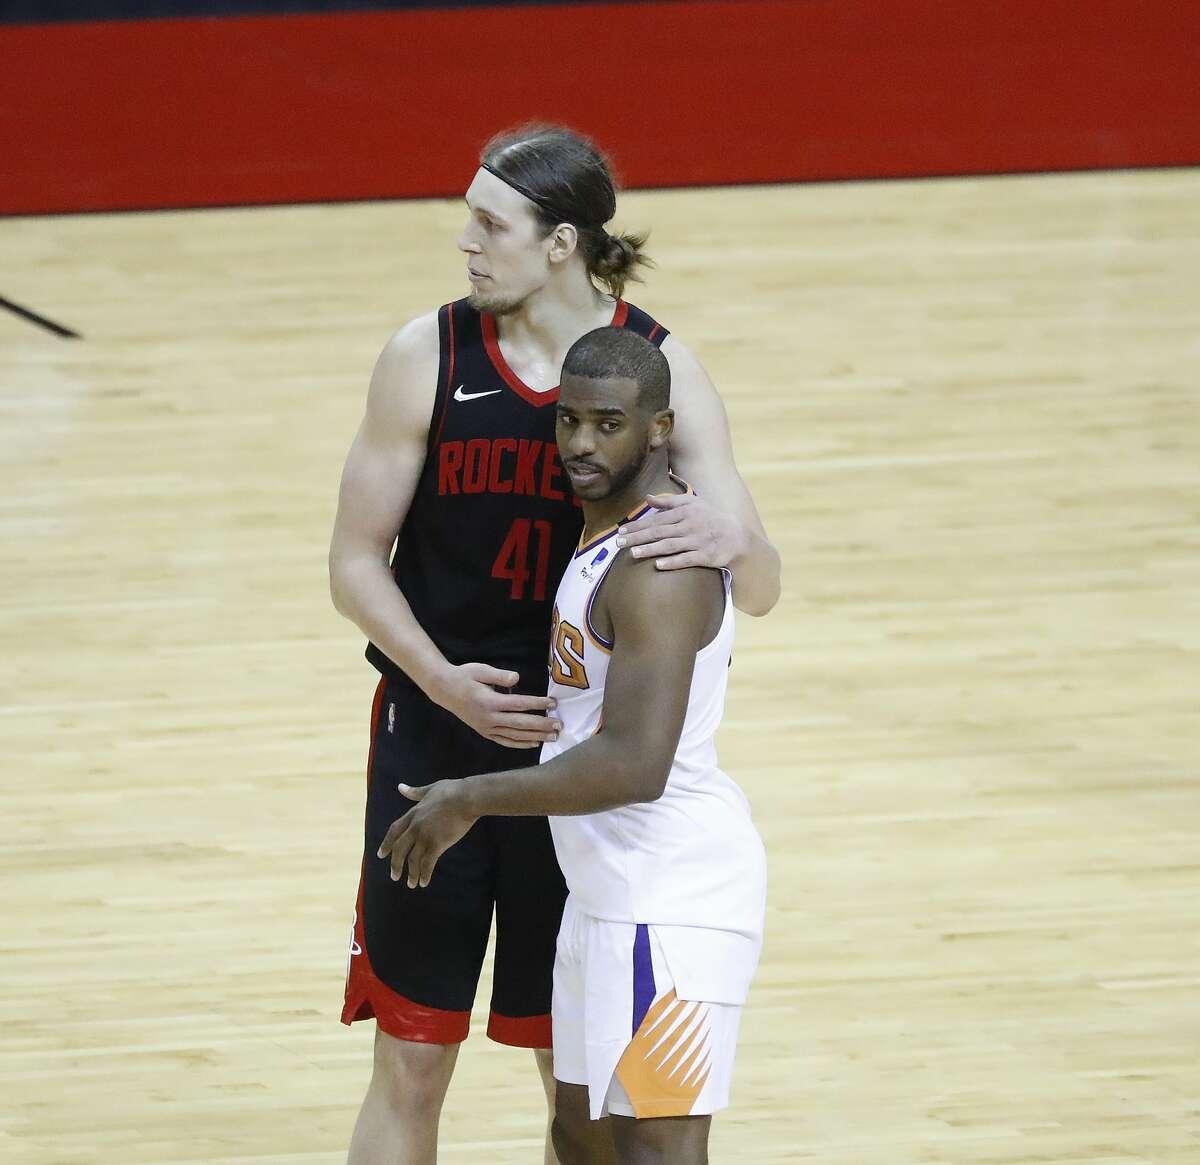 Houston Rockets forward Kelly Olynyk (41) hugs Phoenix Suns guard Chris Paul (3) after an NBA basketball game at Toyota Center, Monday, April 5, 2021.